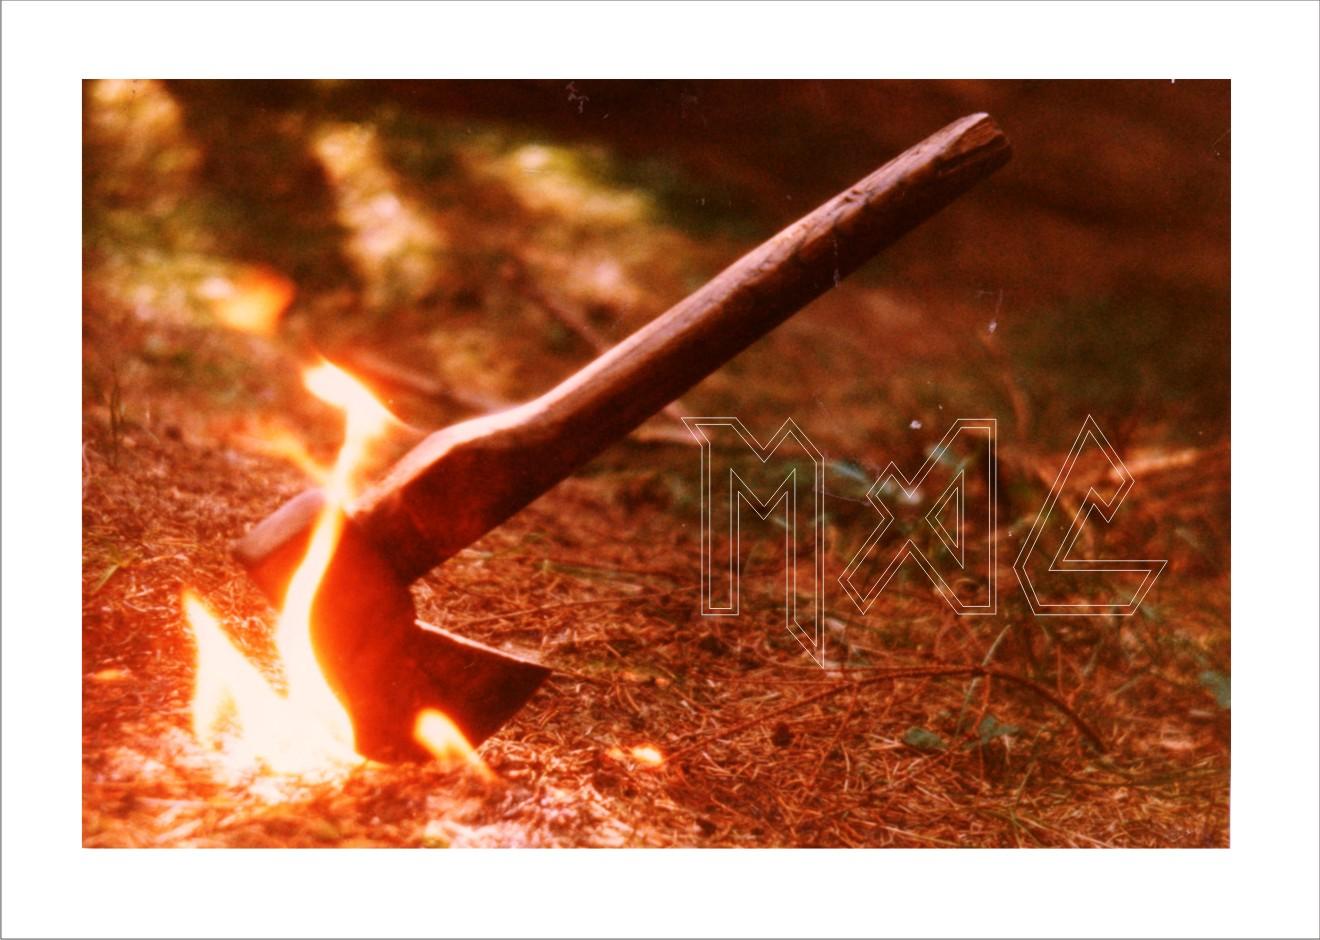 brennendes Beil